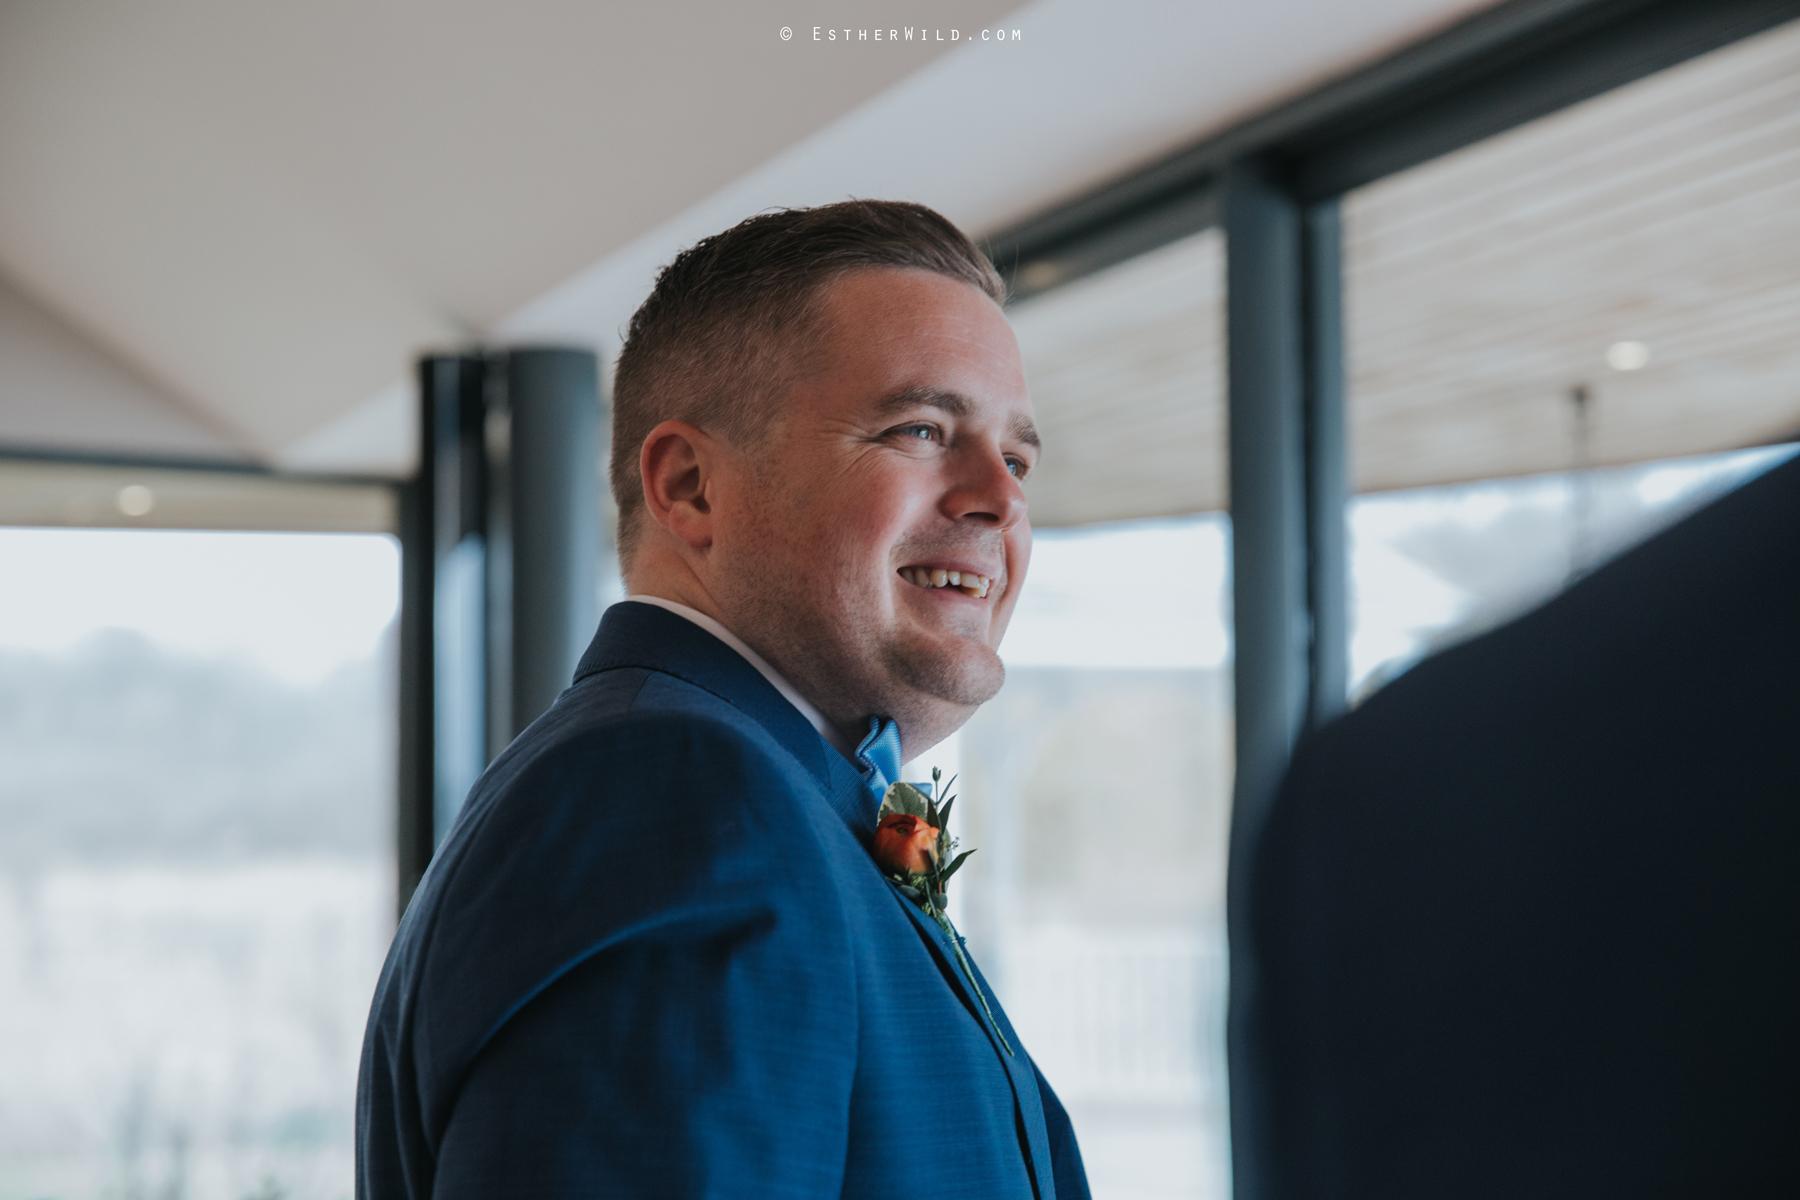 The_BoatHouse_Wedding_Venue_Ormesby_Norfolk_Broads_Boat_Wedding_Photography_Esther_Wild_Photographer_IMG_0831.jpg